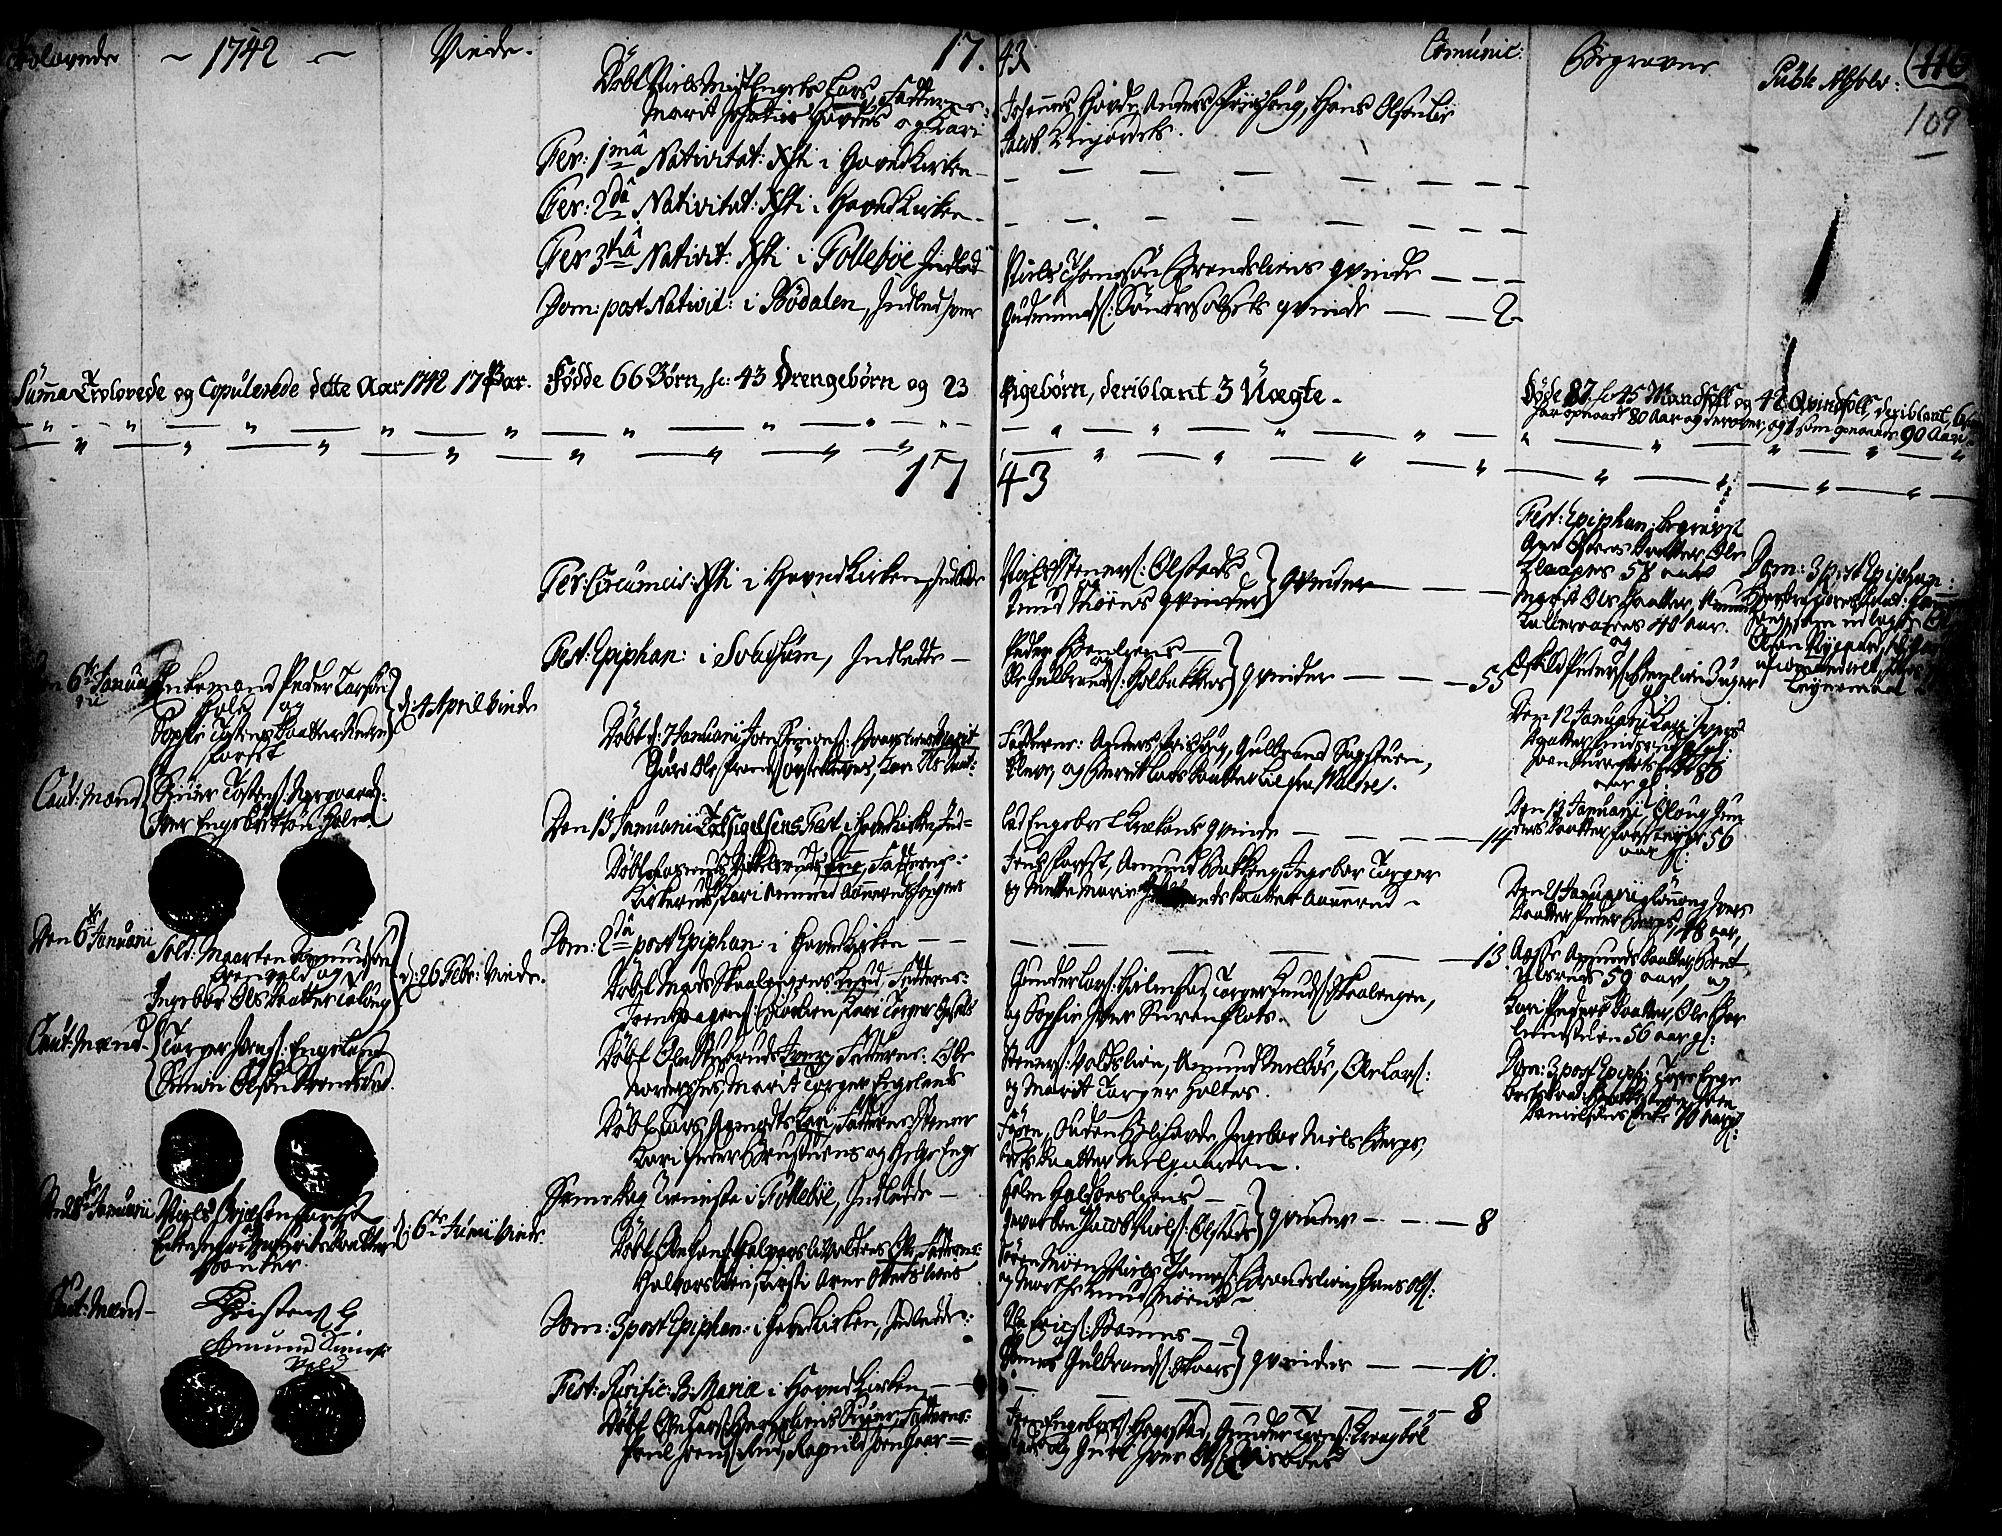 SAH, Gausdal prestekontor, Ministerialbok nr. 2, 1729-1757, s. 109